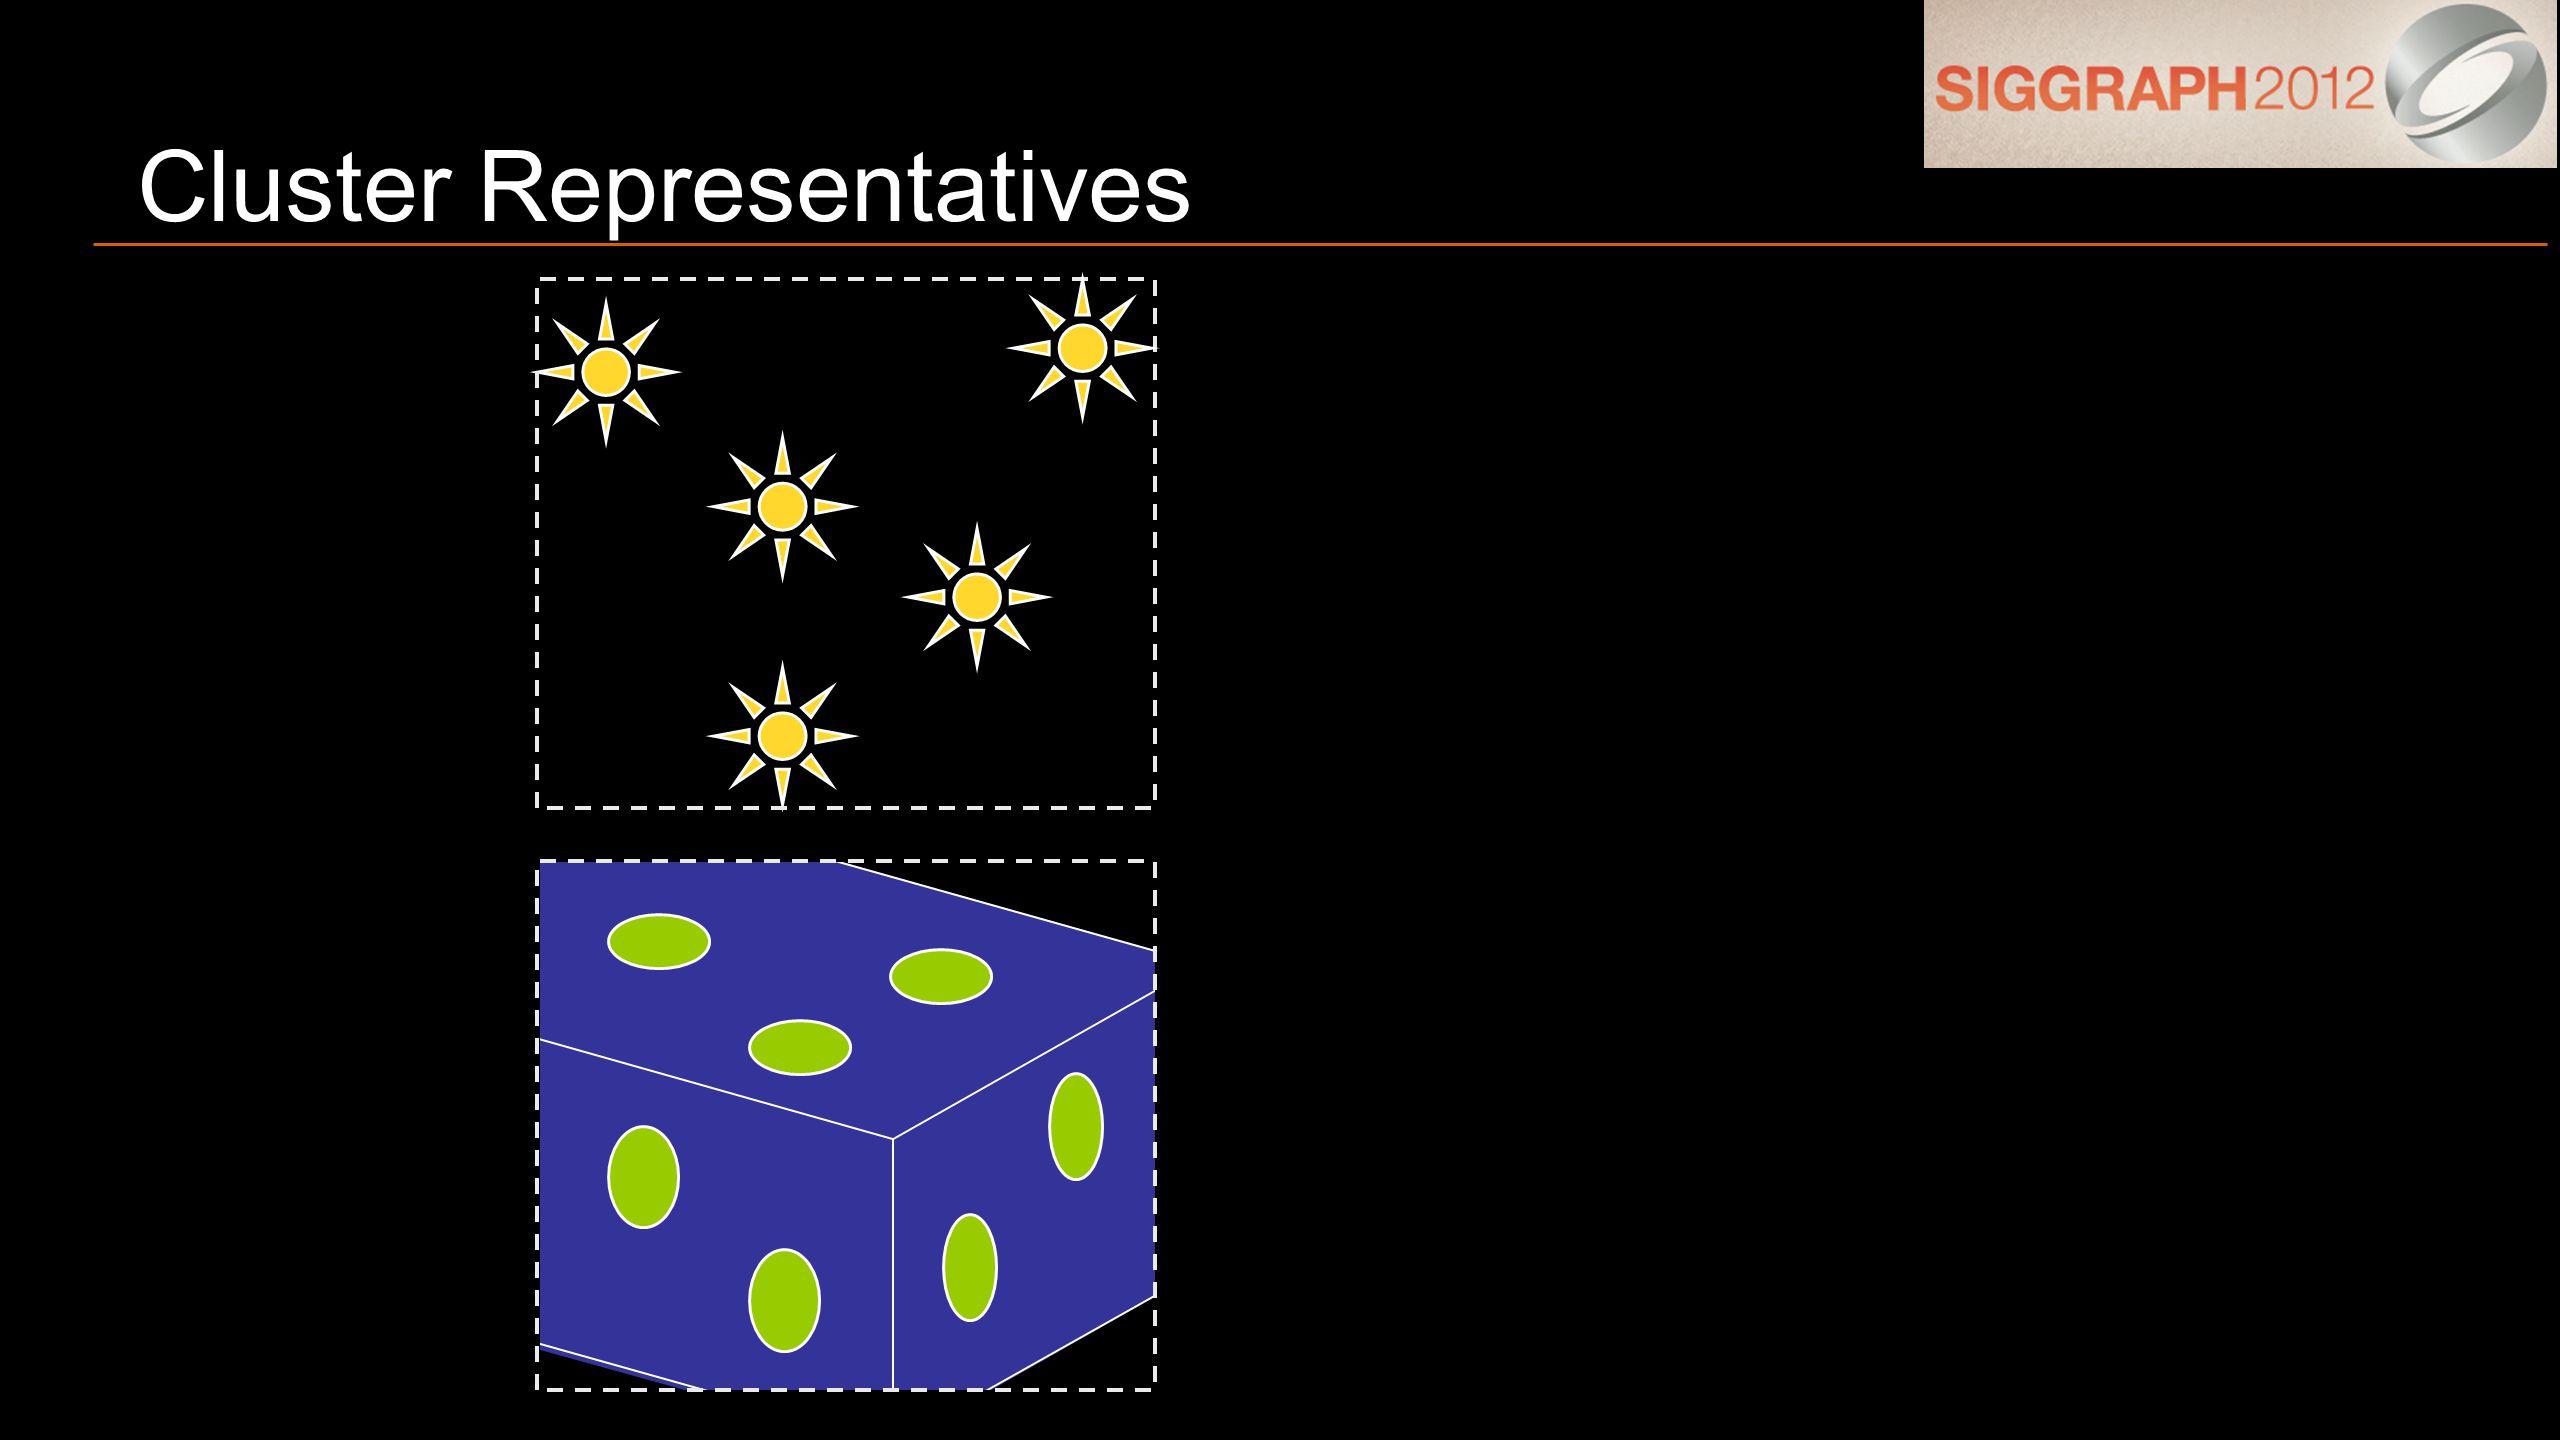 Cluster Representatives